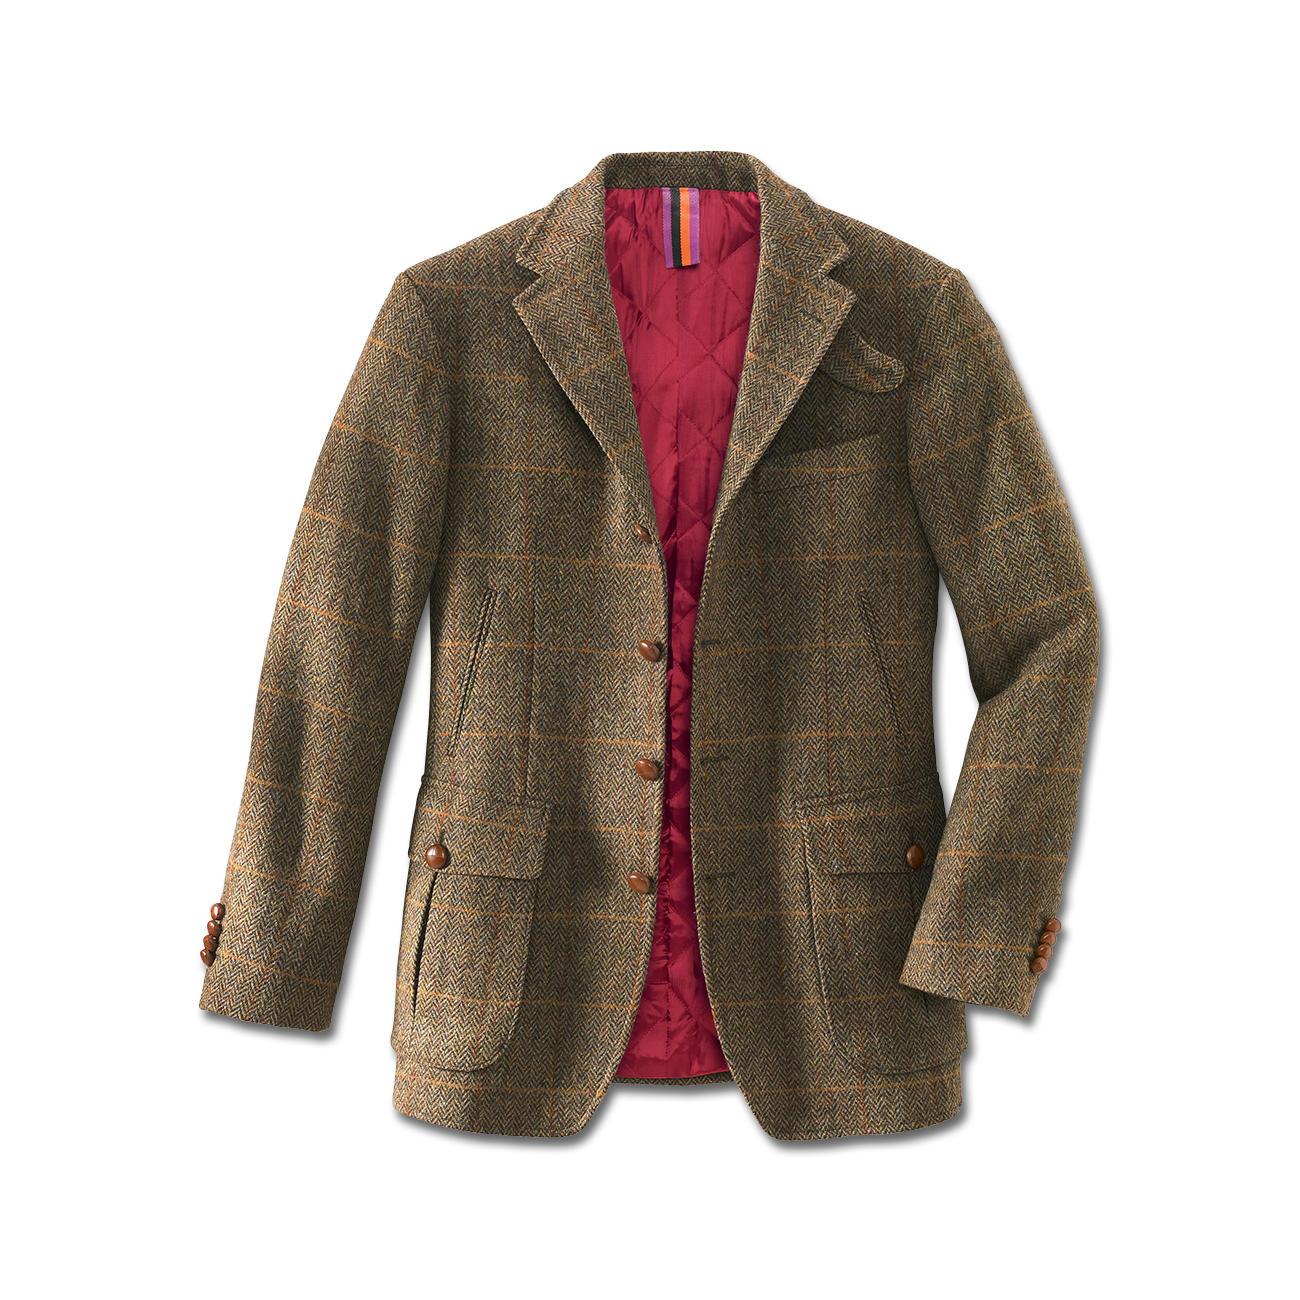 acheter veste de chasse irish tweed en ligne pas cher. Black Bedroom Furniture Sets. Home Design Ideas